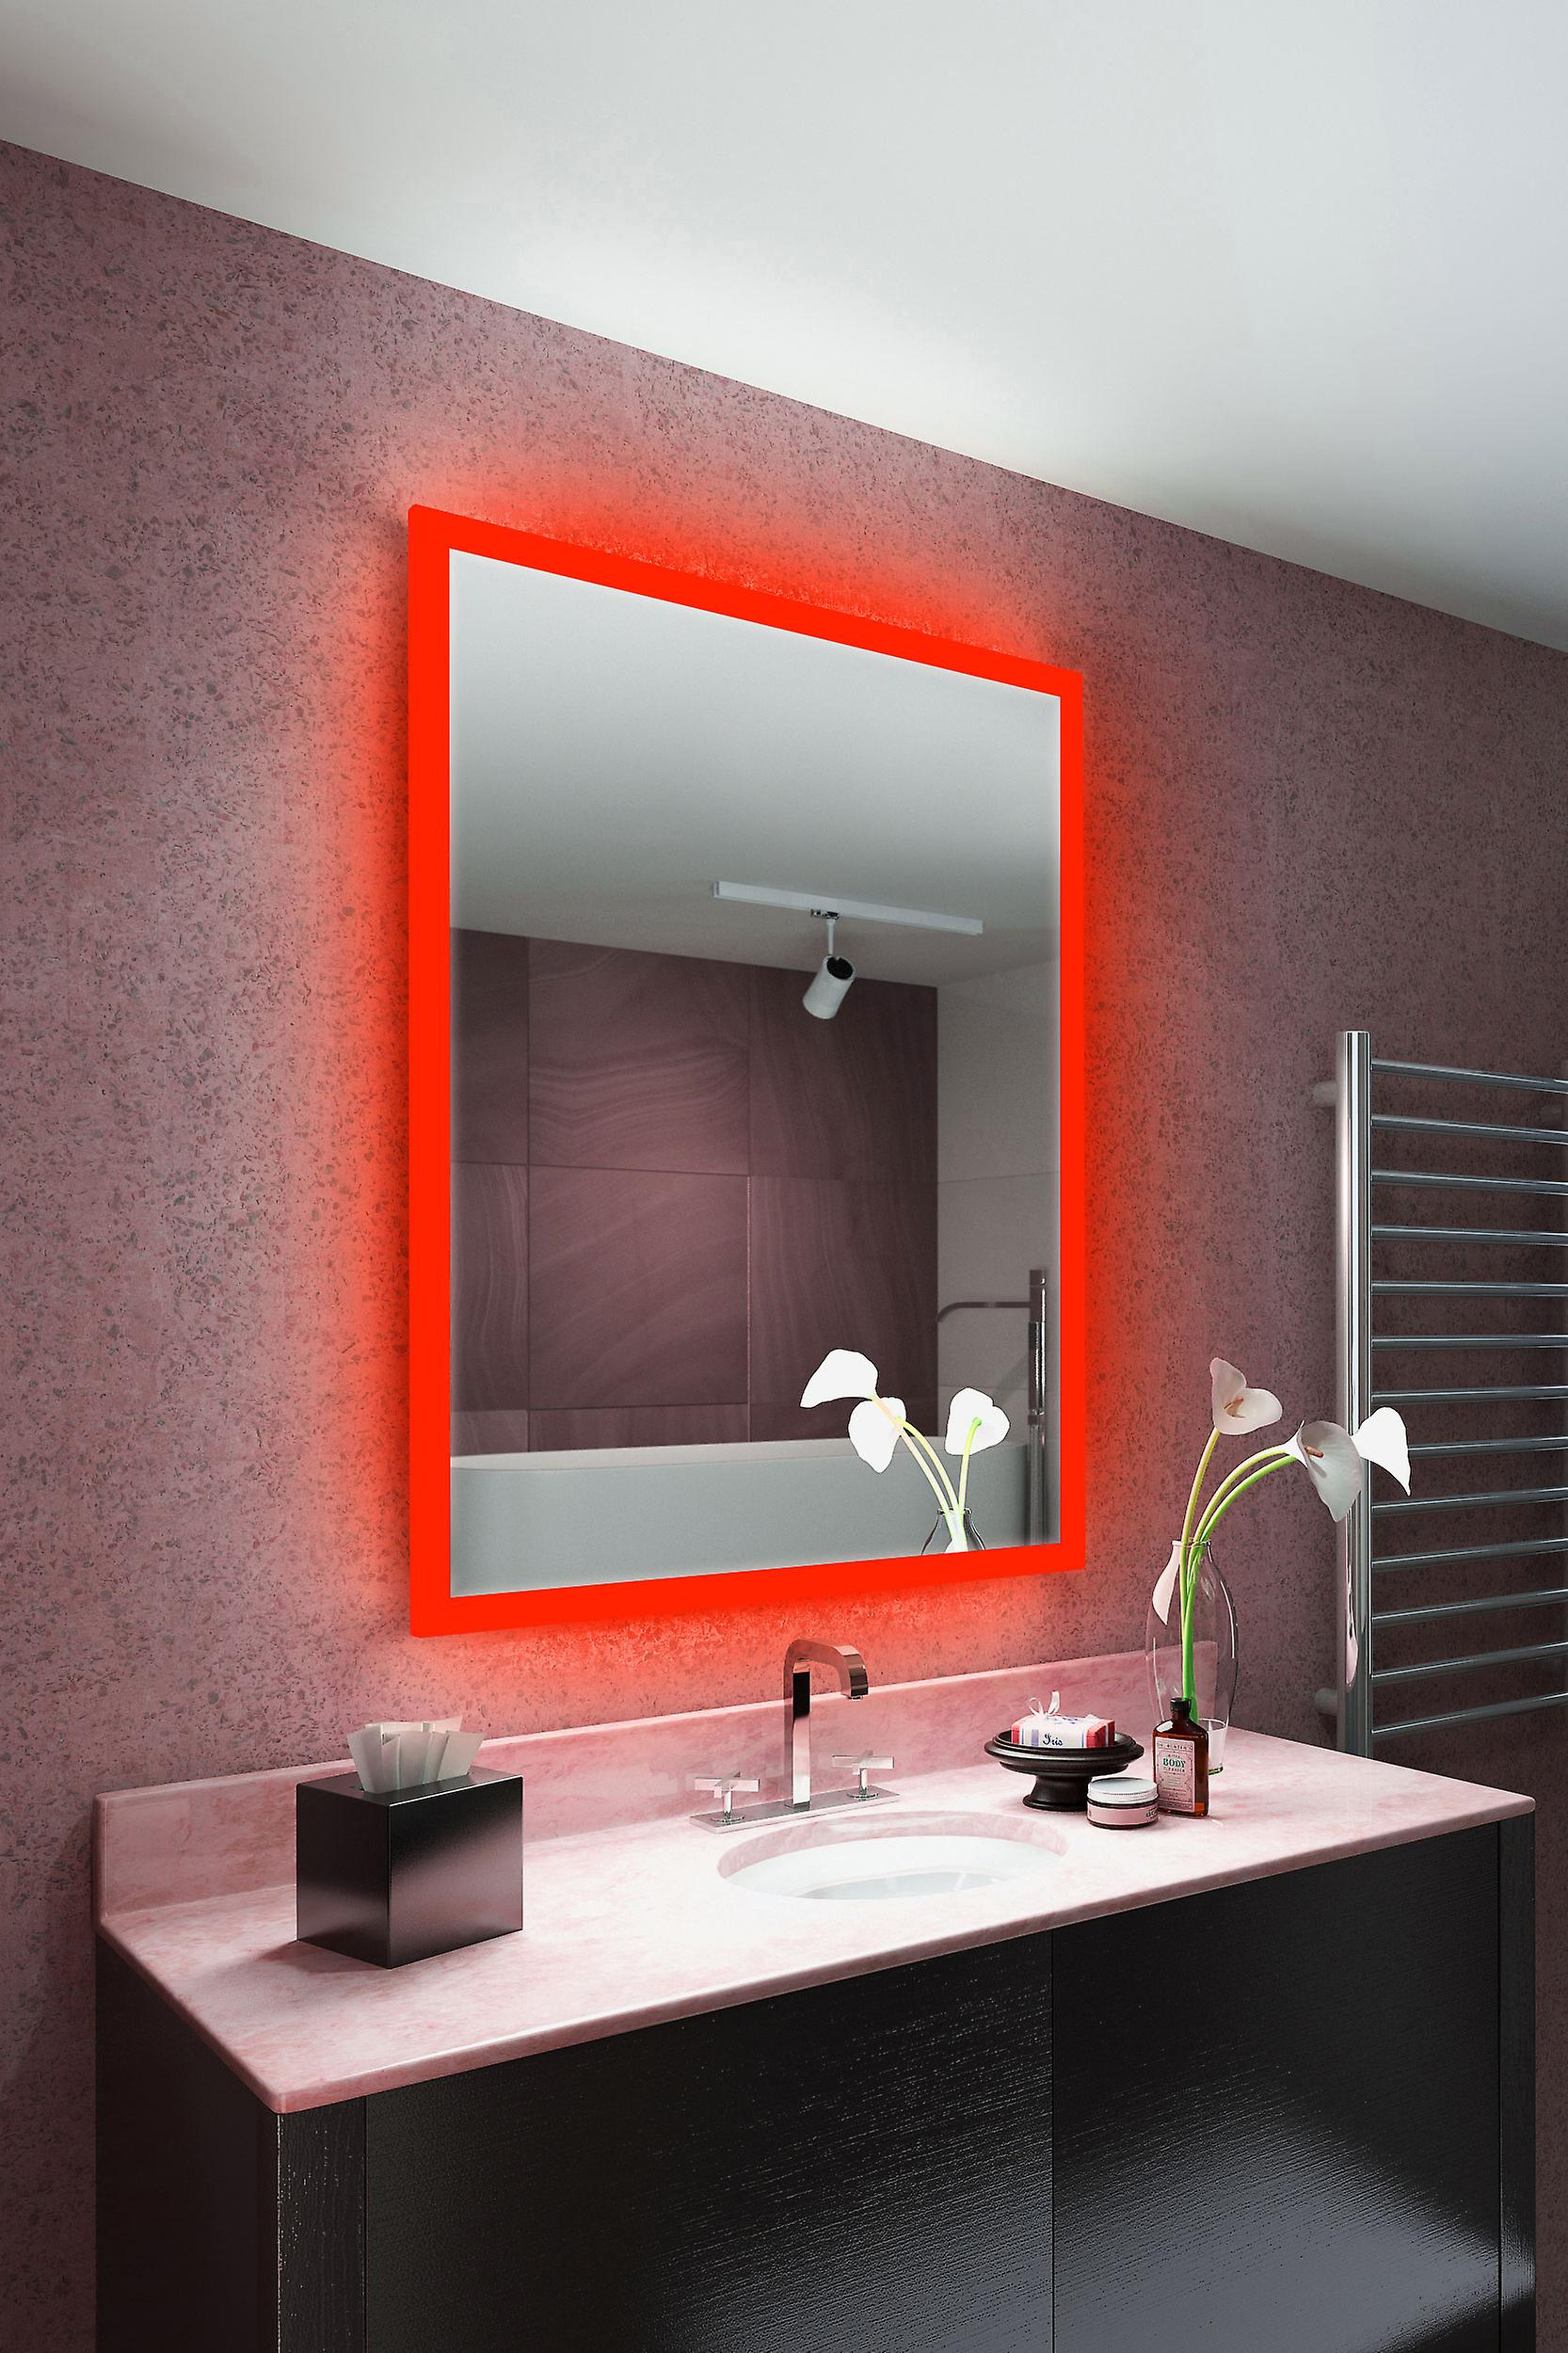 RGB Shaver LED Mirror with Demister pad & sensor m1418ivrgb